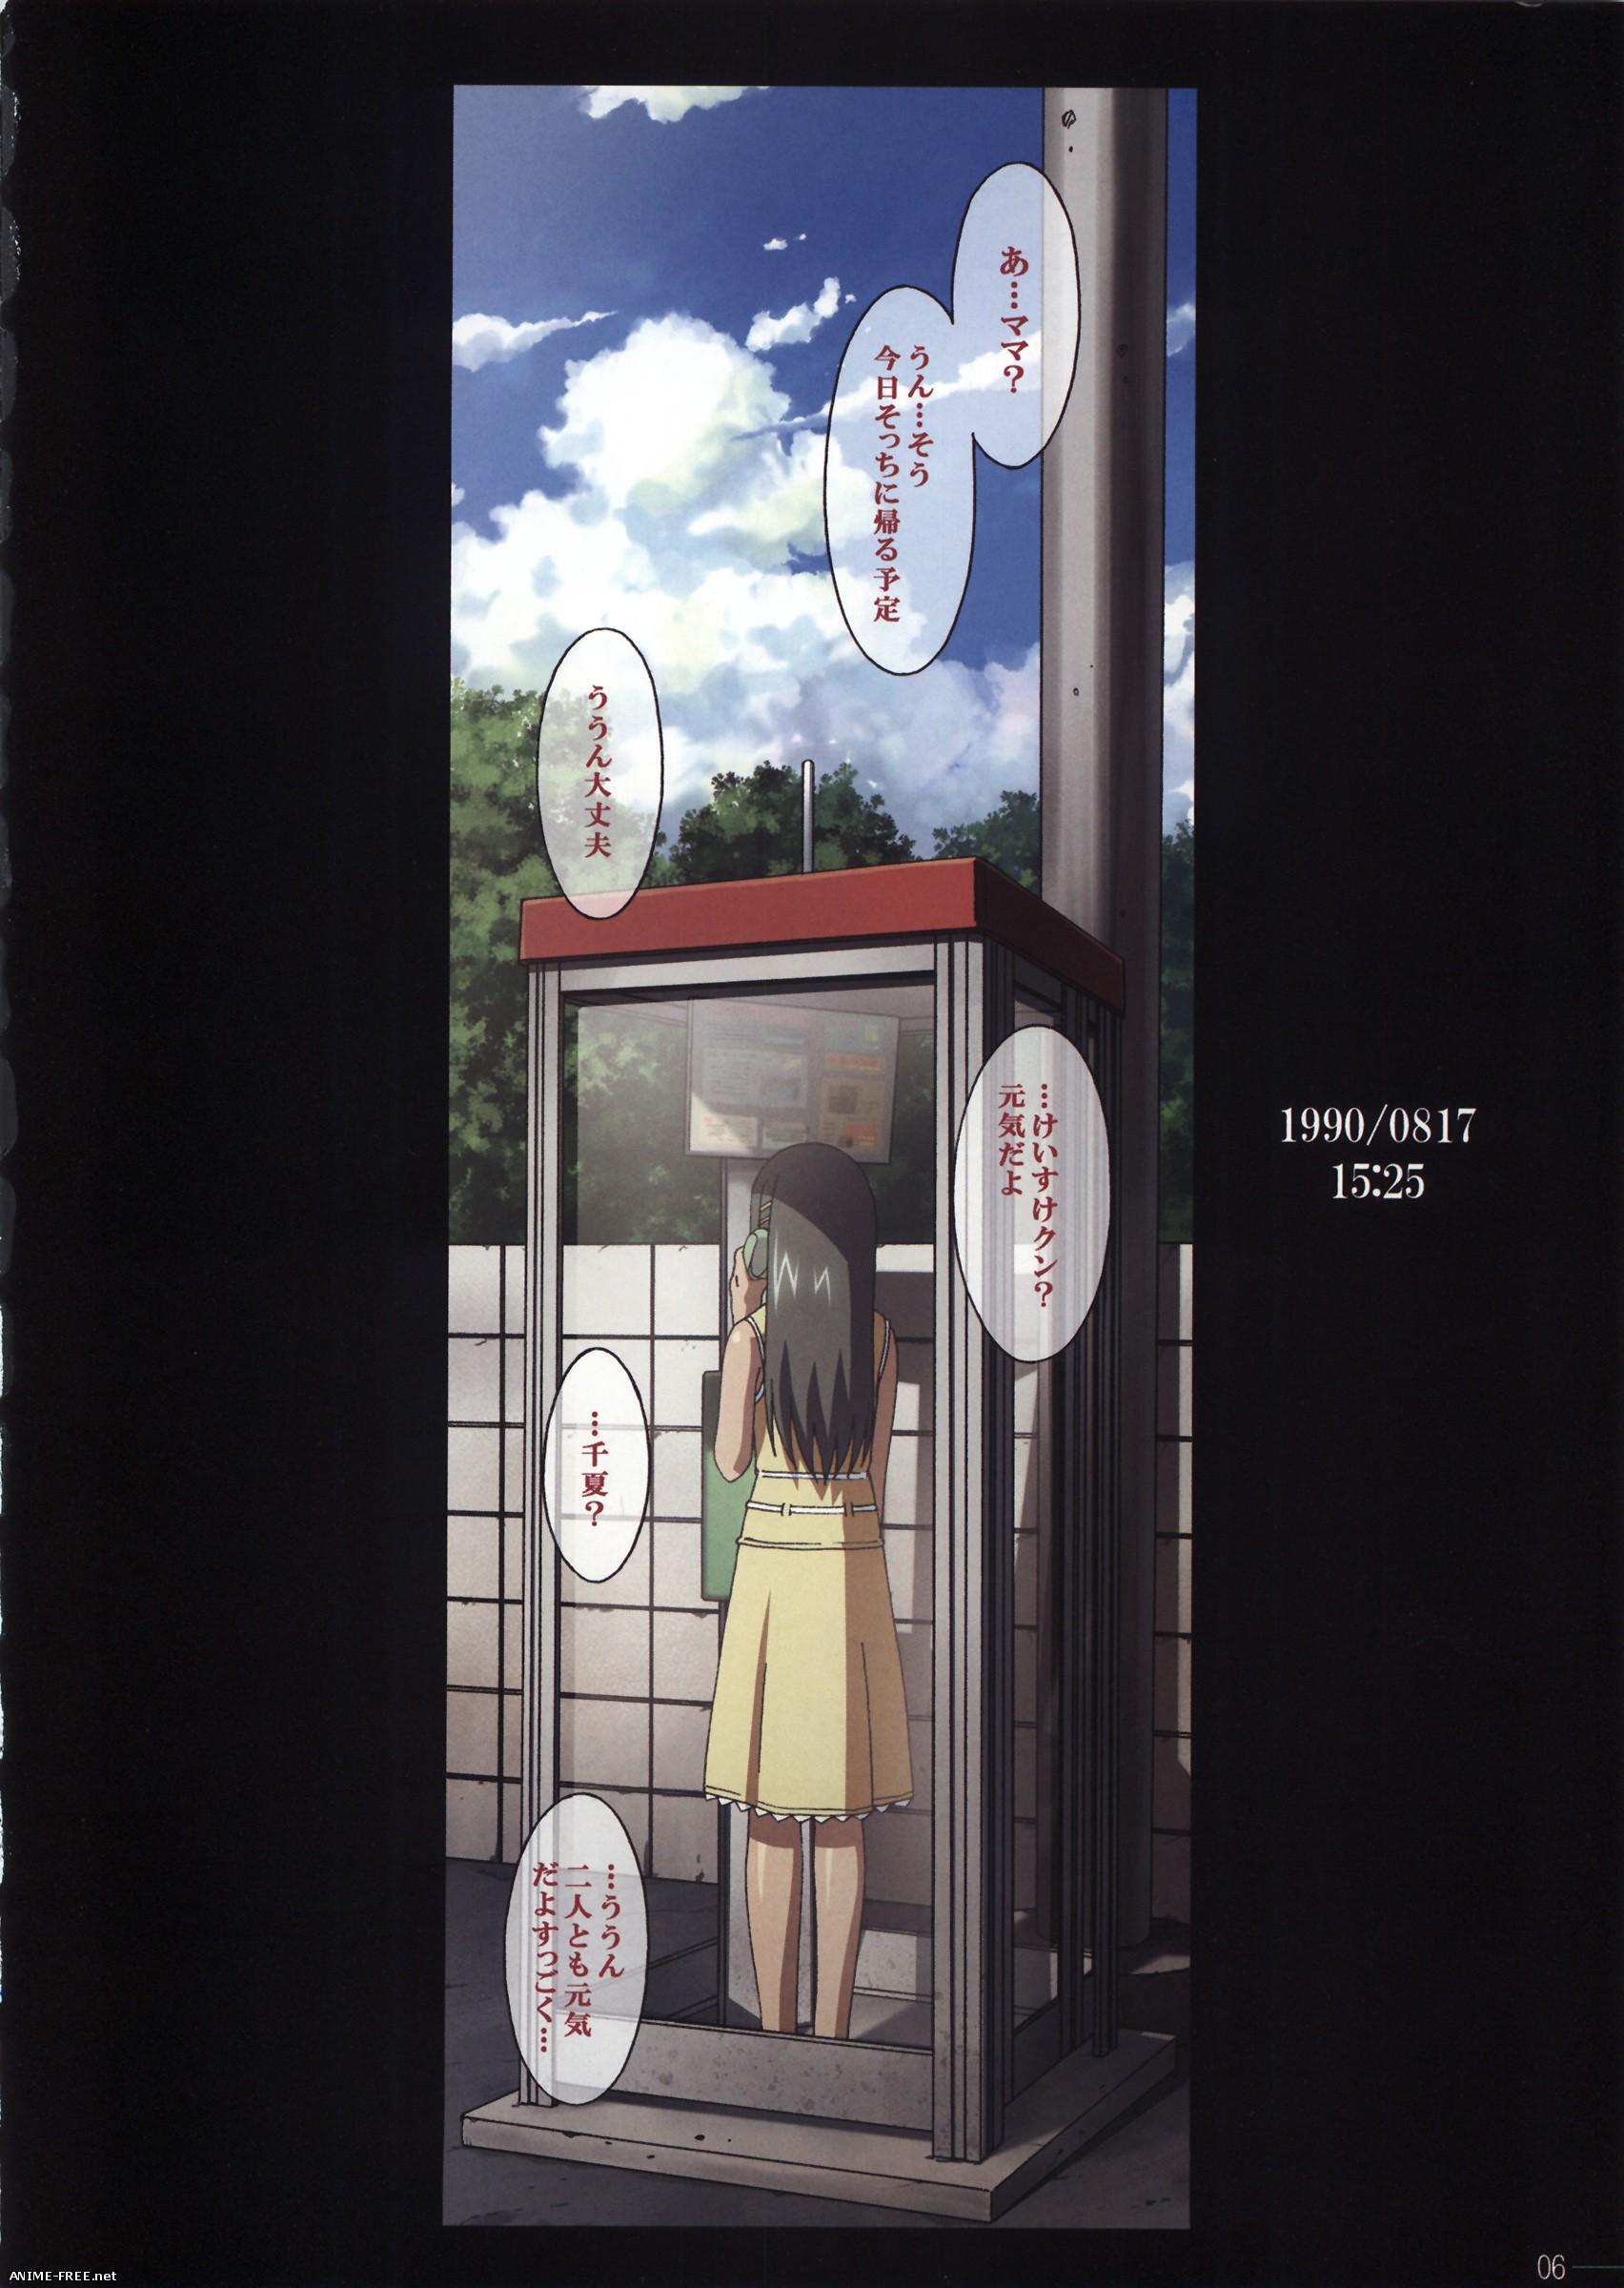 Taki Minashika / Makino Jimusho - (сборник работ) [Cen] [JAP] Manga Hentai